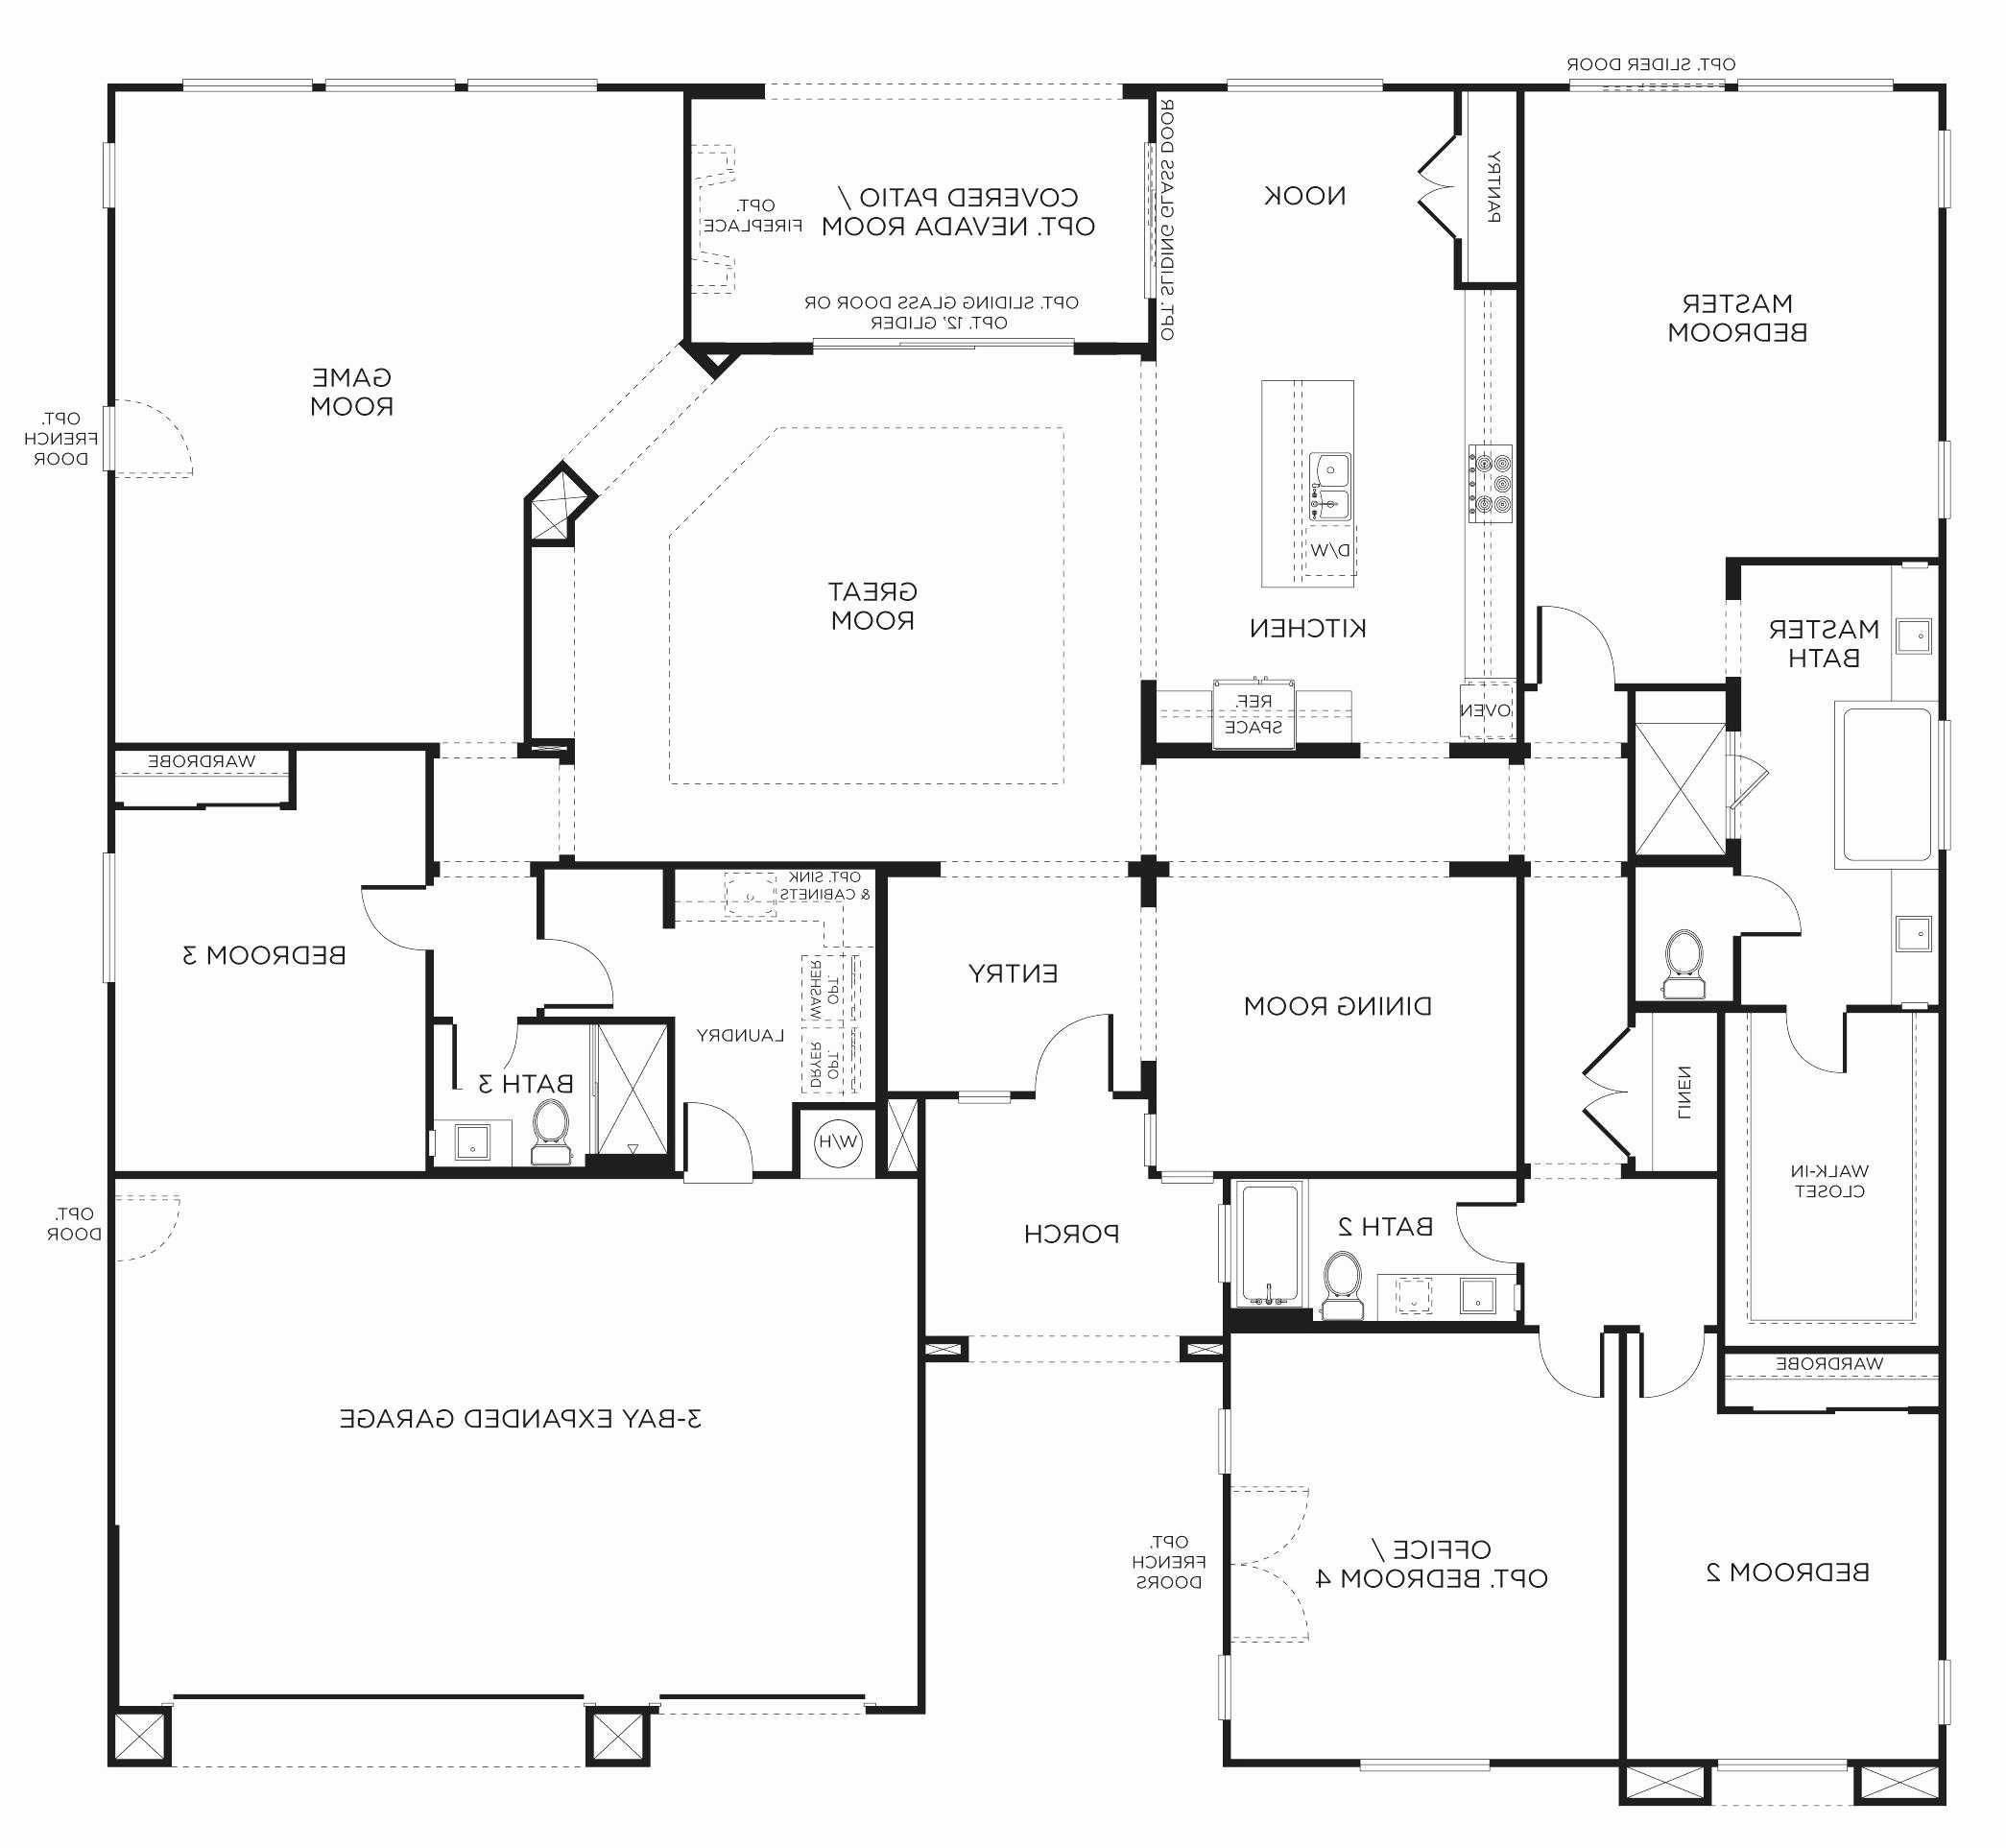 Open Concept Single Story Farmhouse Plans Elegant 2 Story House